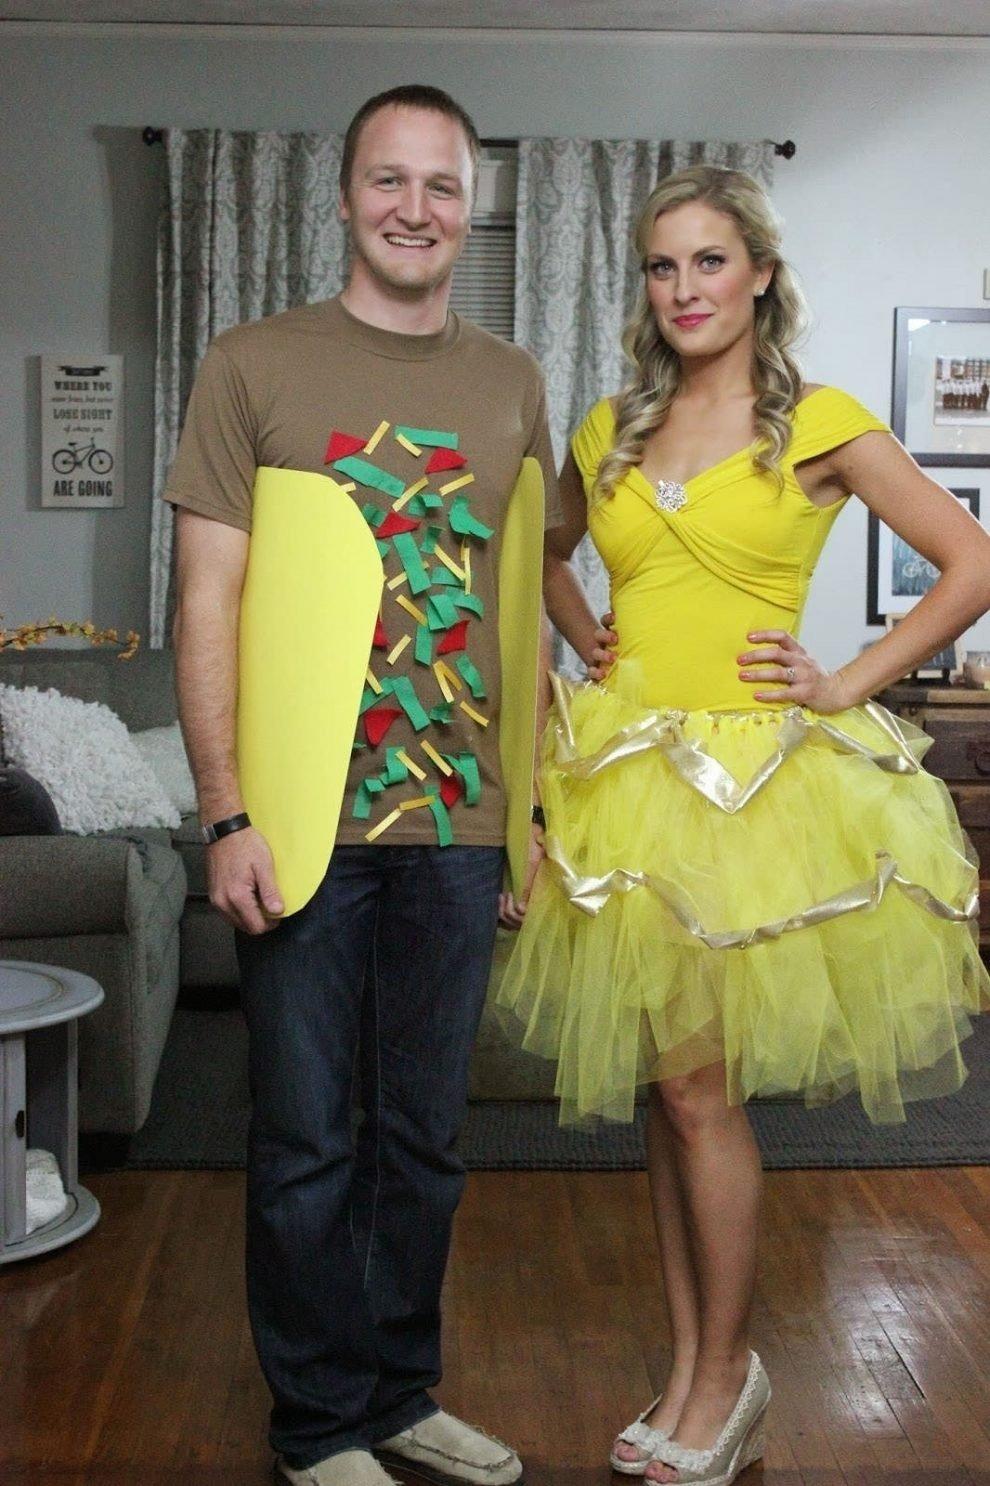 10 Attractive Cheap Couple Halloween Costume Ideas cheap and easy halloween costumes for couples ideas 2